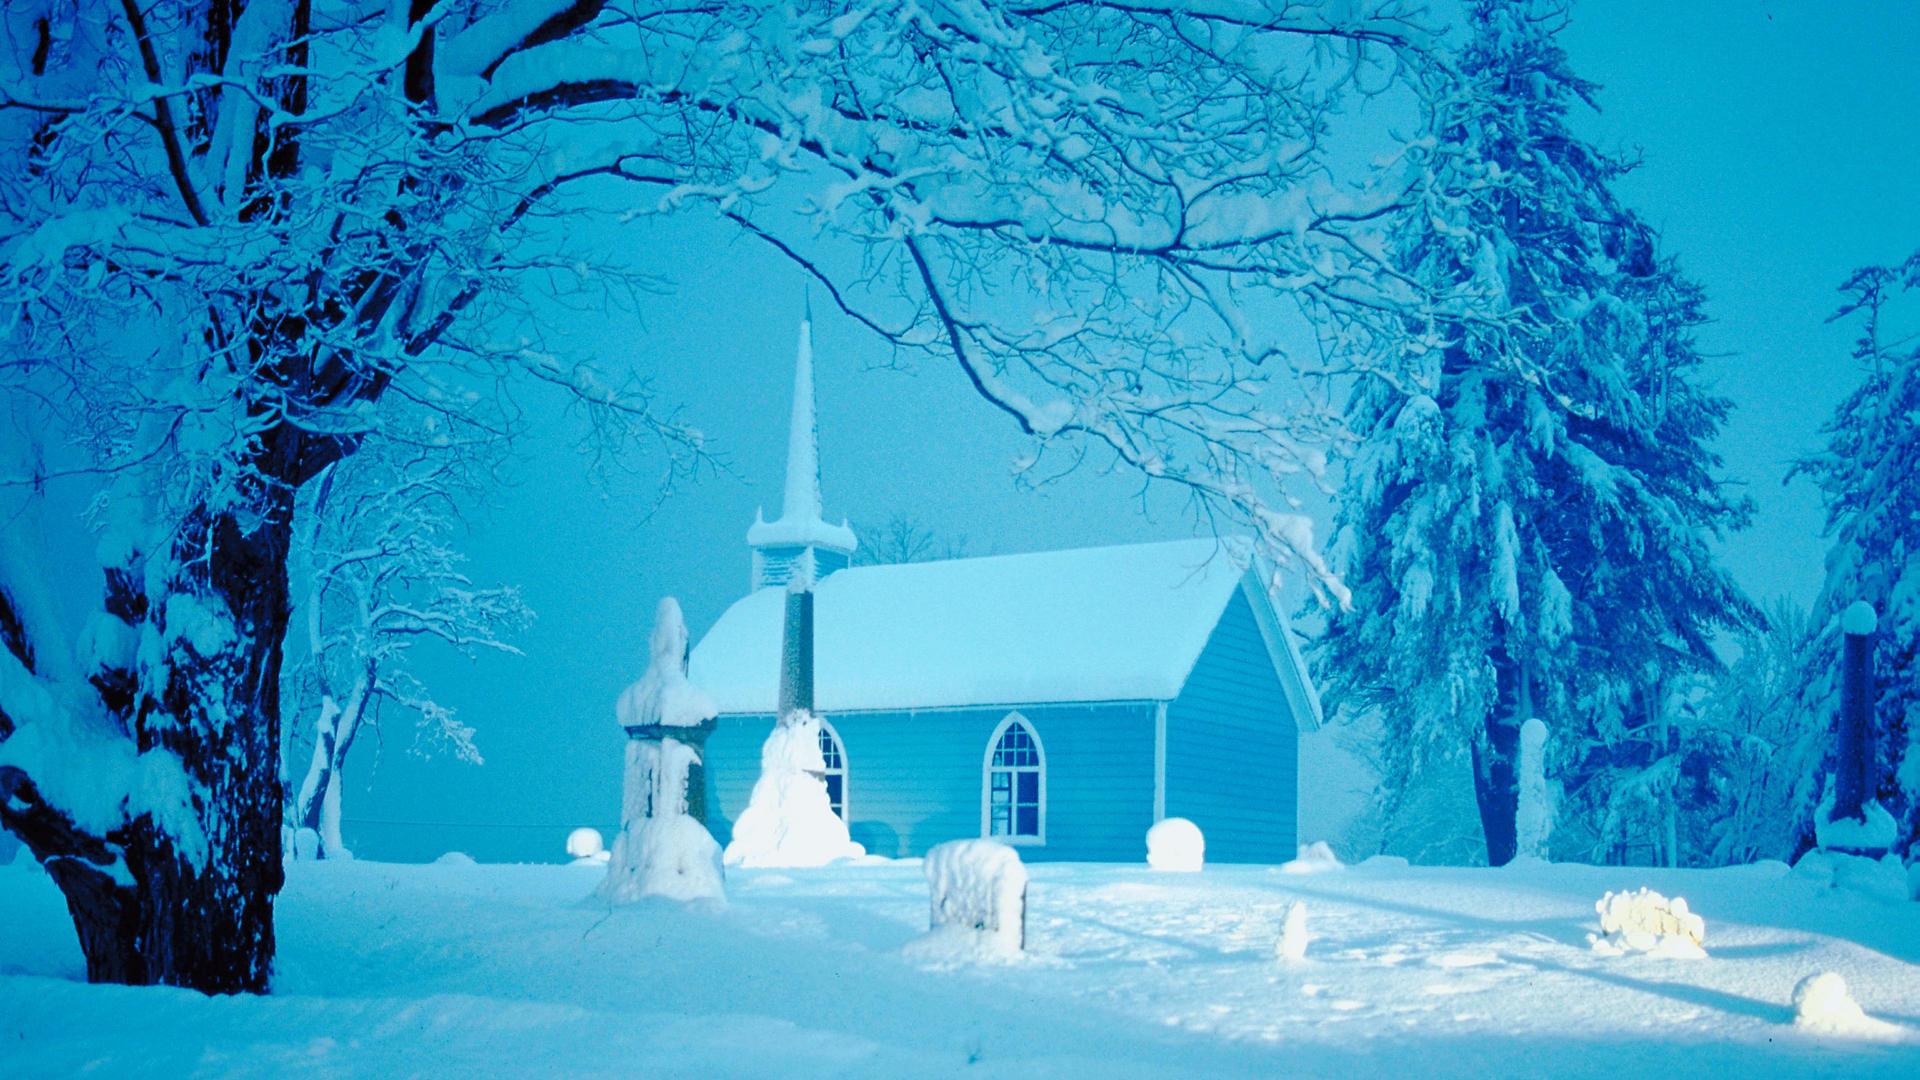 Snowy Winter Scenes Wallpaper | … Snowy Scene, It Looks Amazing Overall –